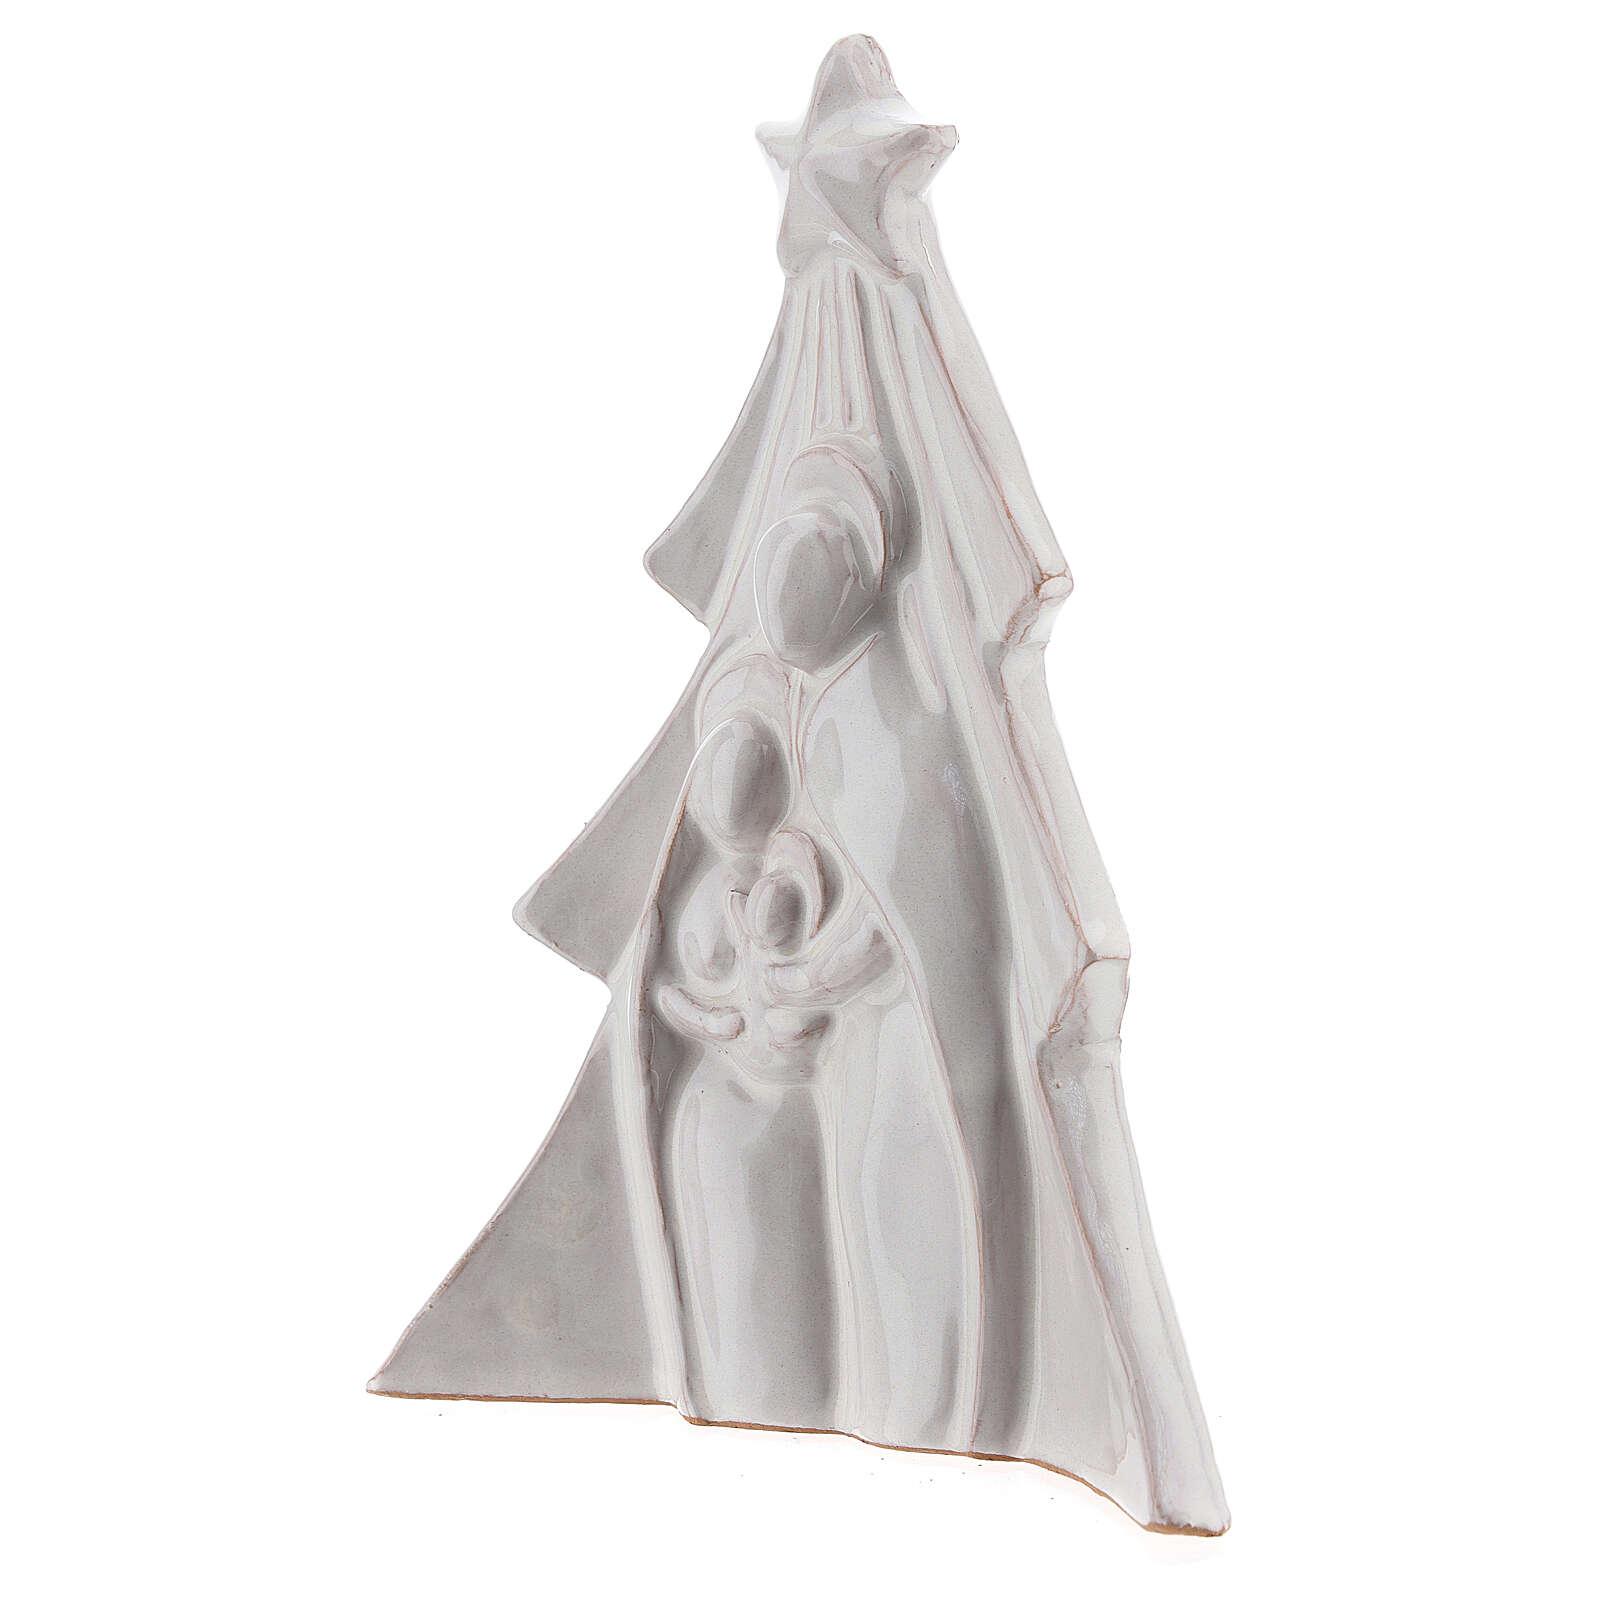 Árbol Navidad terracota blanca rilieve Sagrada Familia Deruta 19x16 cm 4